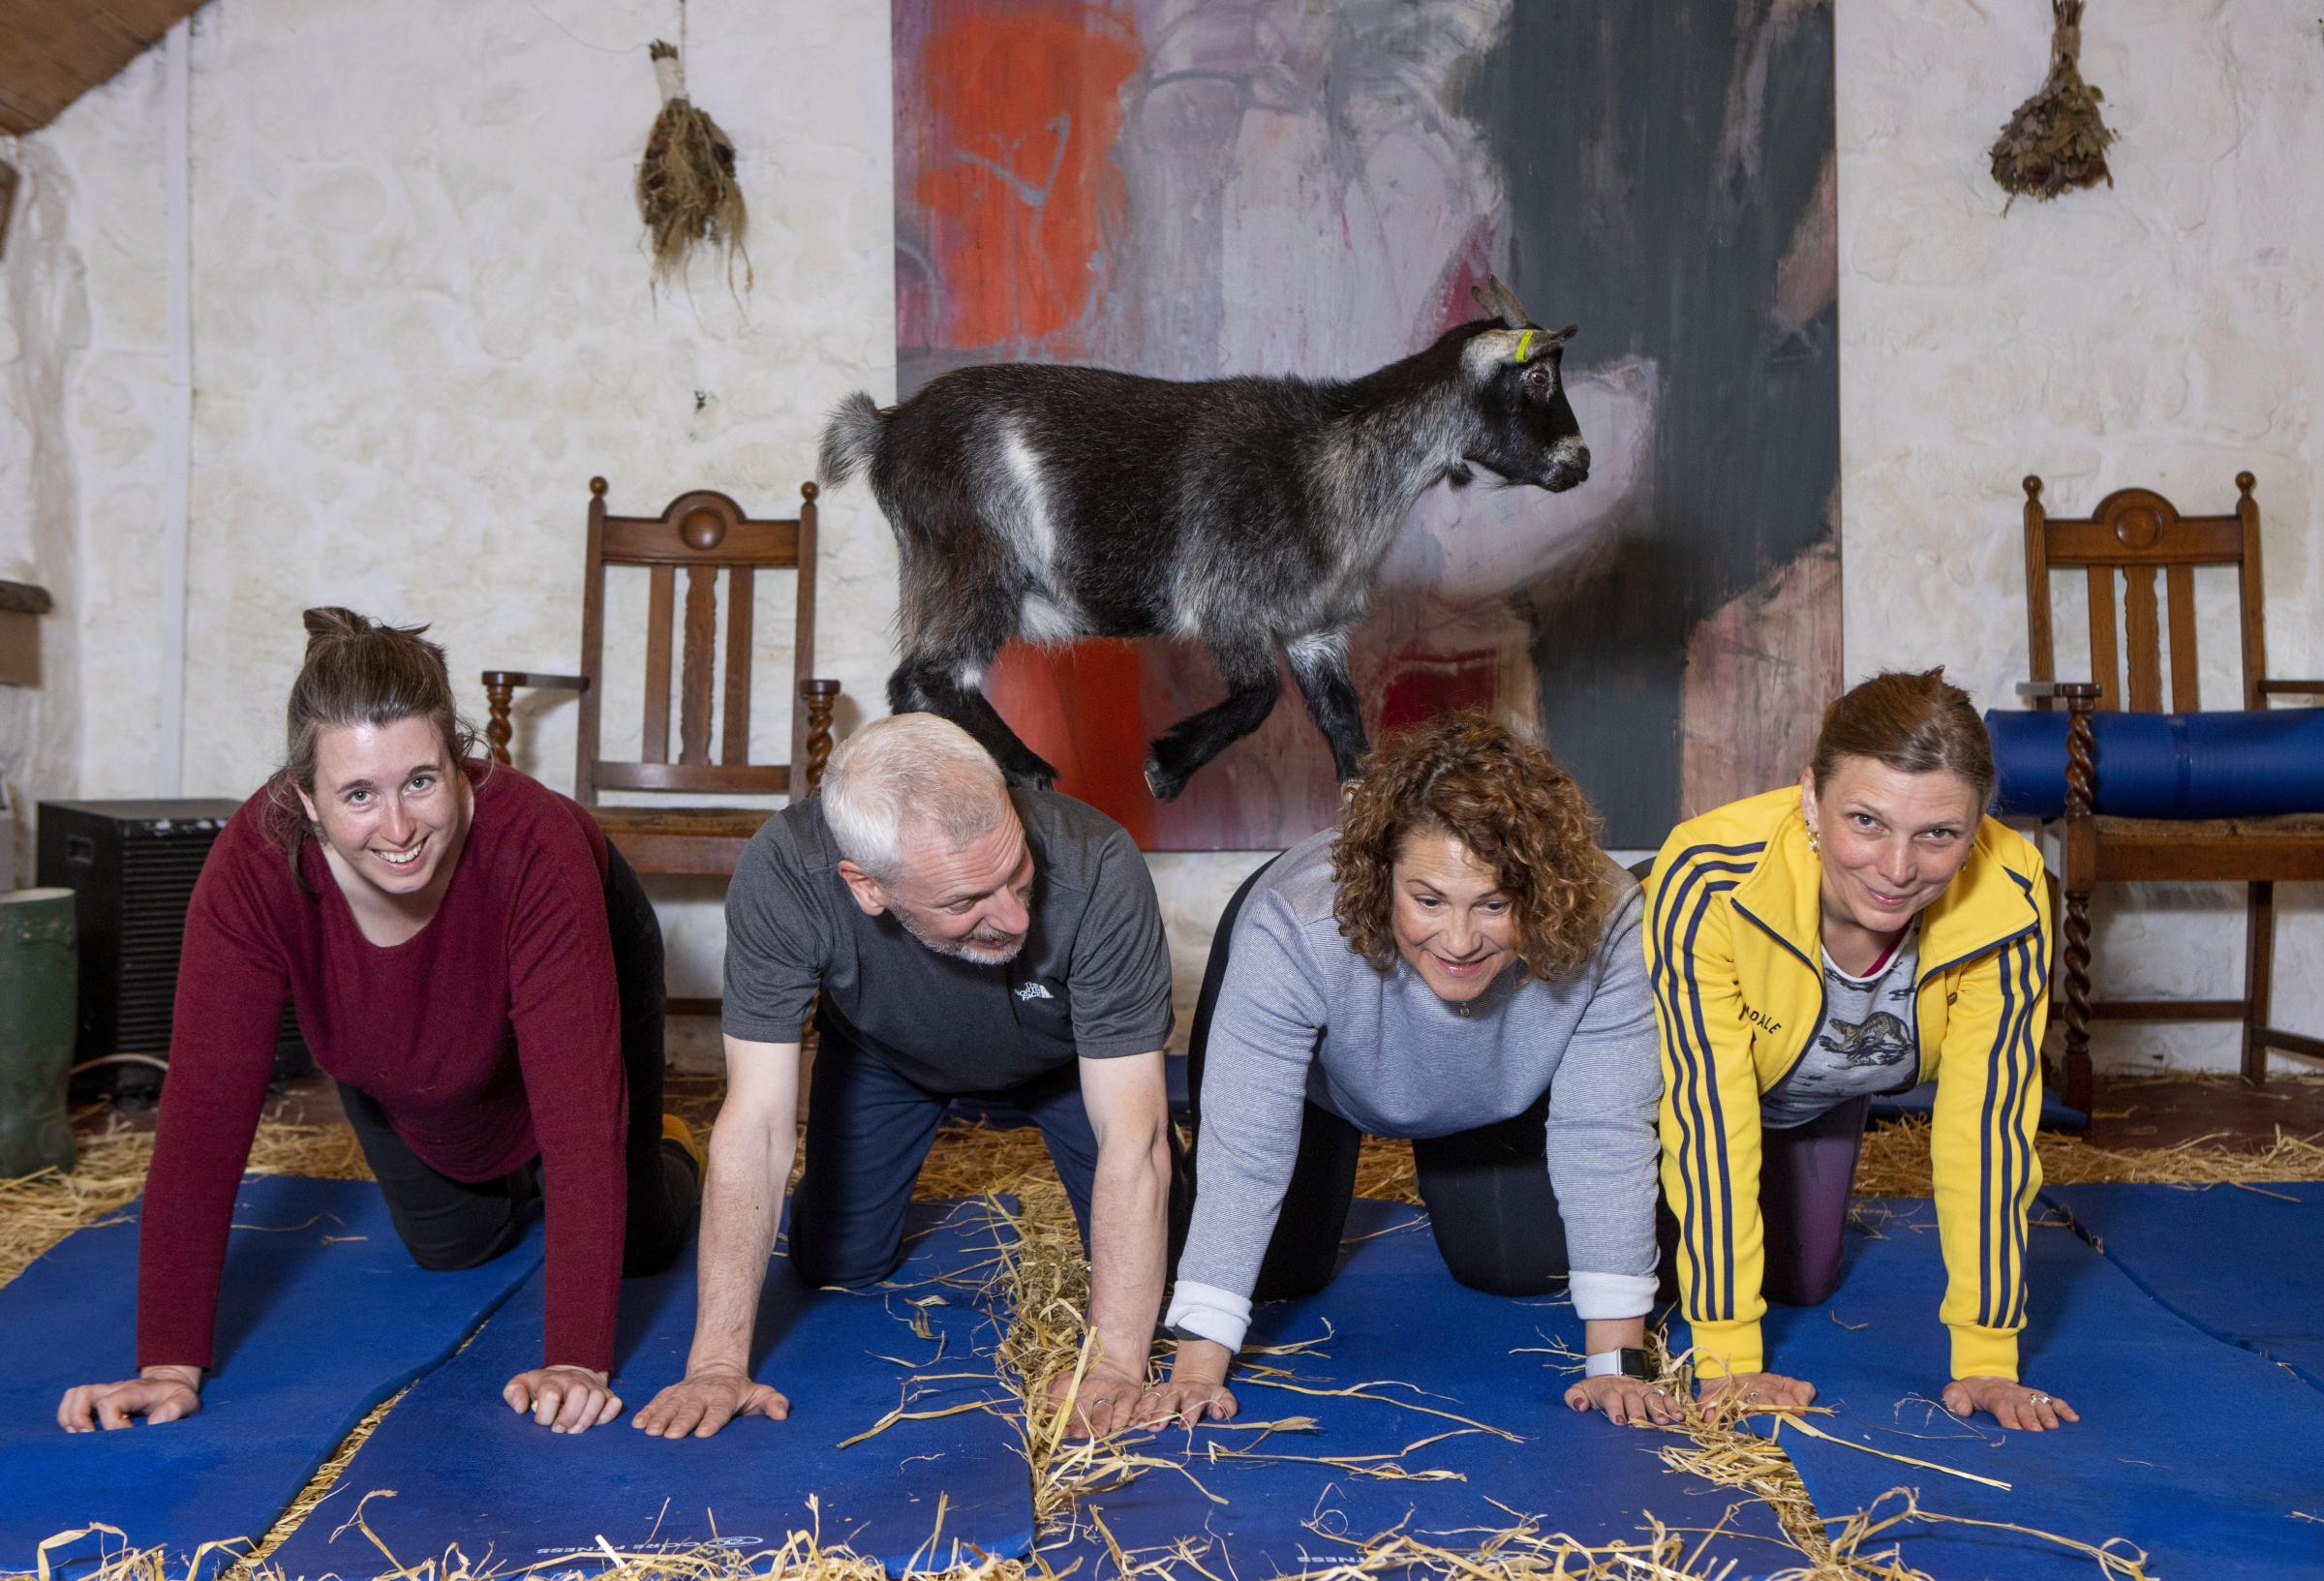 Scotland Goat Massage - మస్త్ మస్త్ మేక మసాజ్ - Video